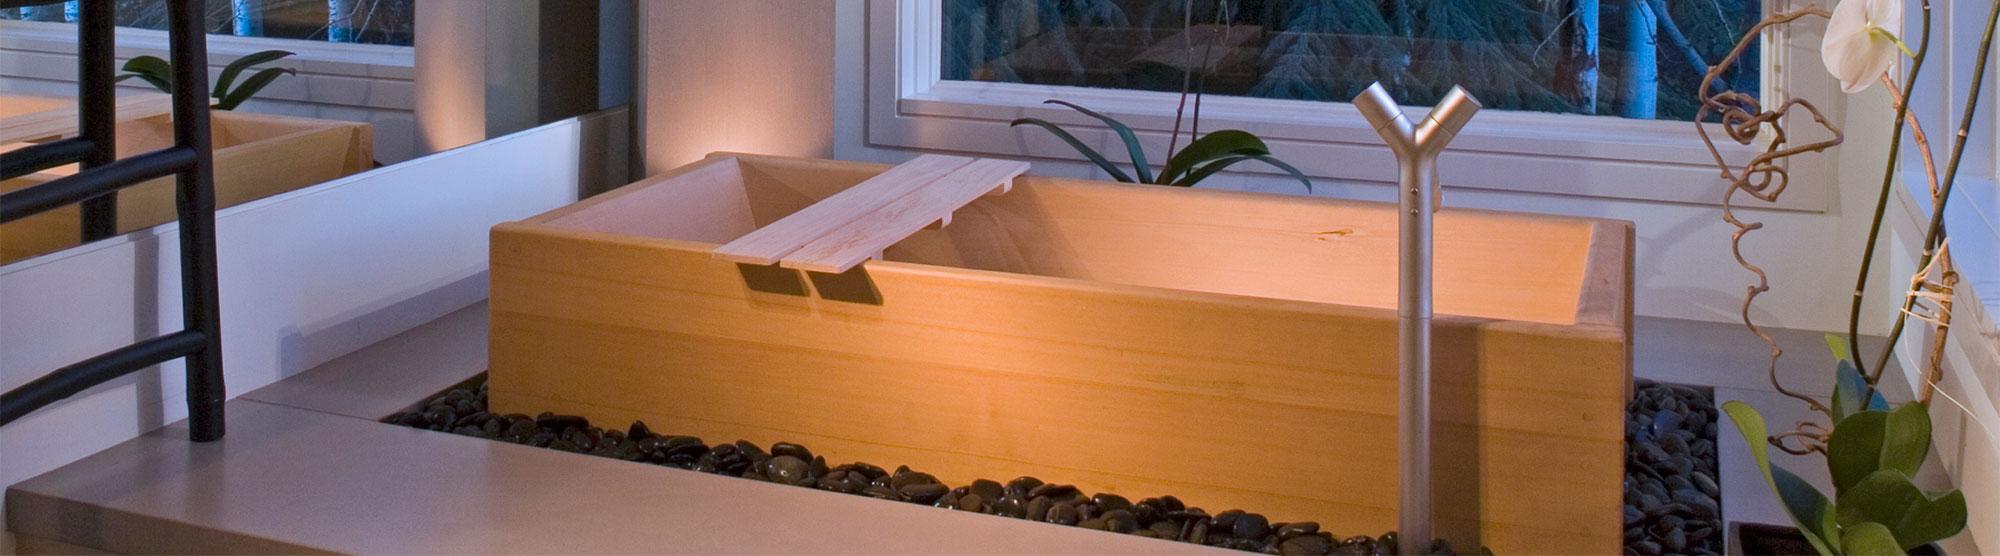 Cedar Hot Tub Japanese Soaking Tubs Free Standing Bathtubs Zen Bathworks